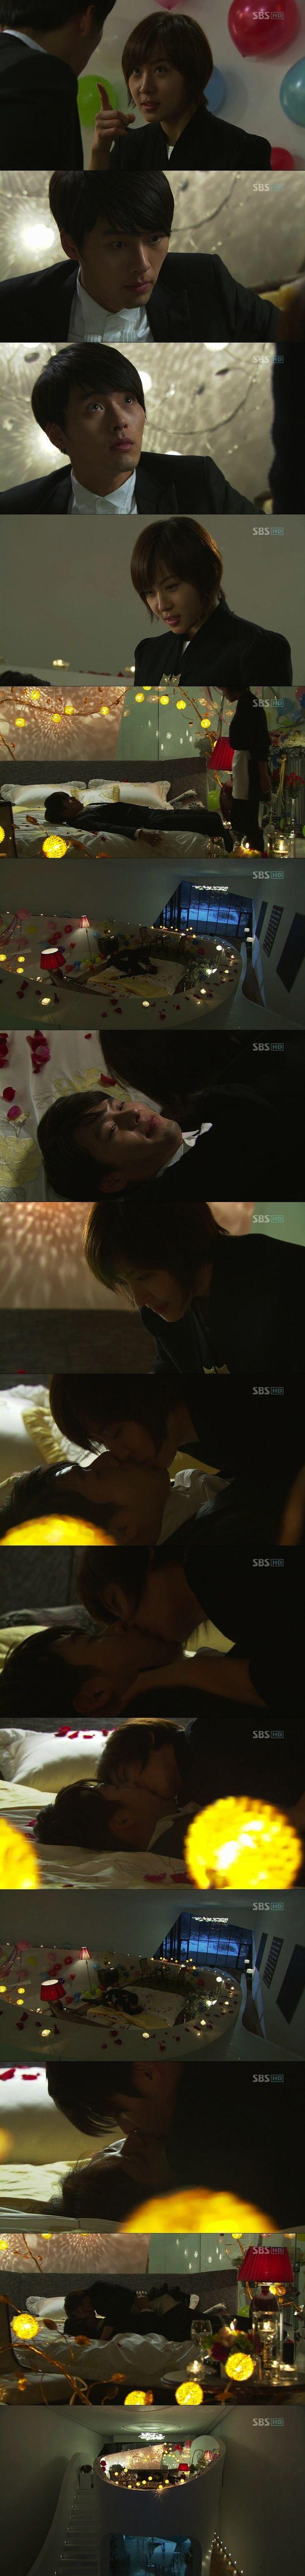 Secret Garden (시크릿 가든) Korean - Drama - Episode 20 - Picture @ HanCinema :: The Korean Movie and Drama Database